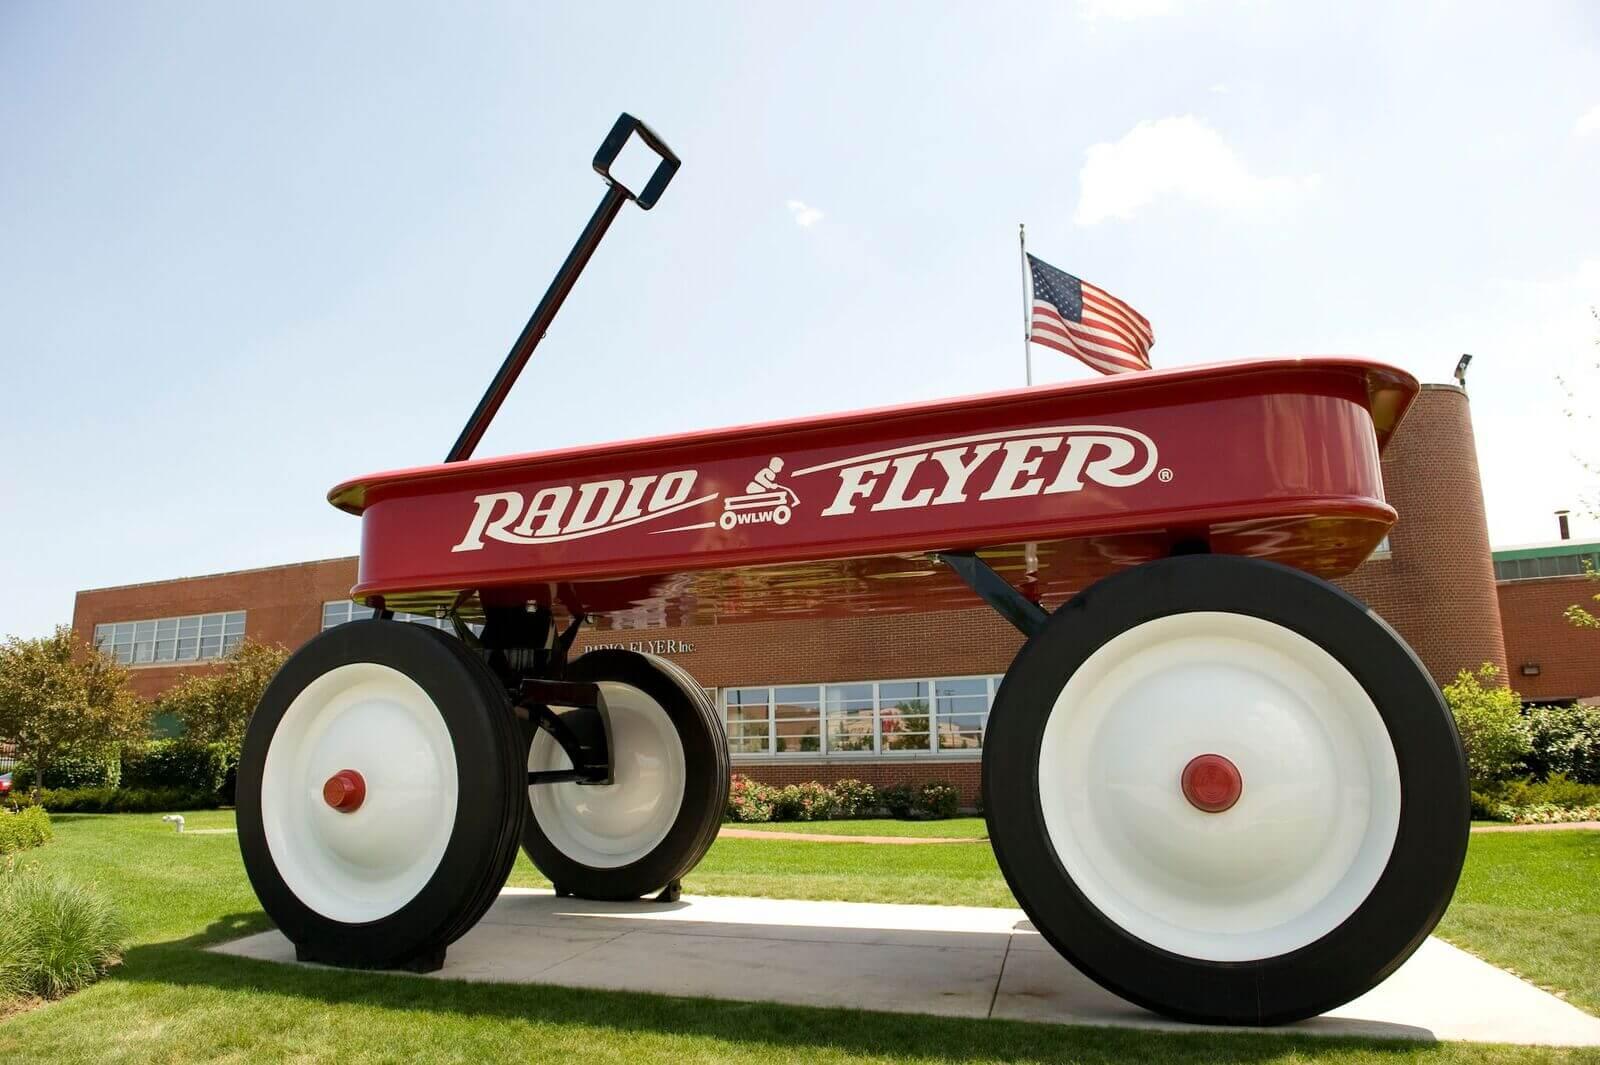 World's Largest Wagon